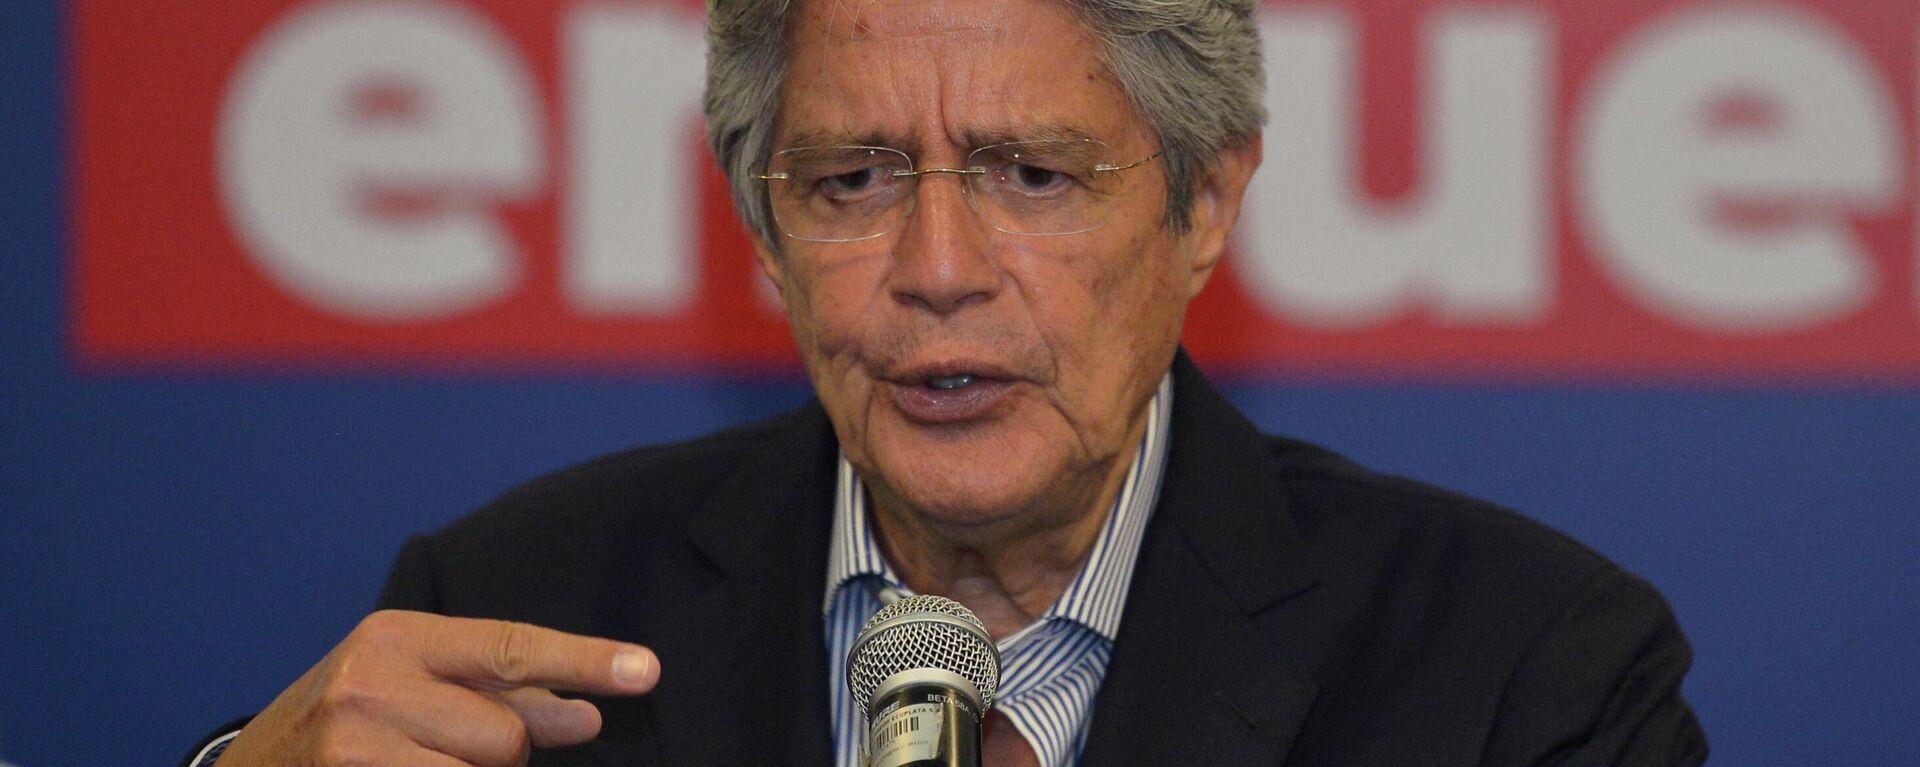 Guillermo Lasso, presidente electo de Ecuador - Sputnik Mundo, 1920, 23.05.2021